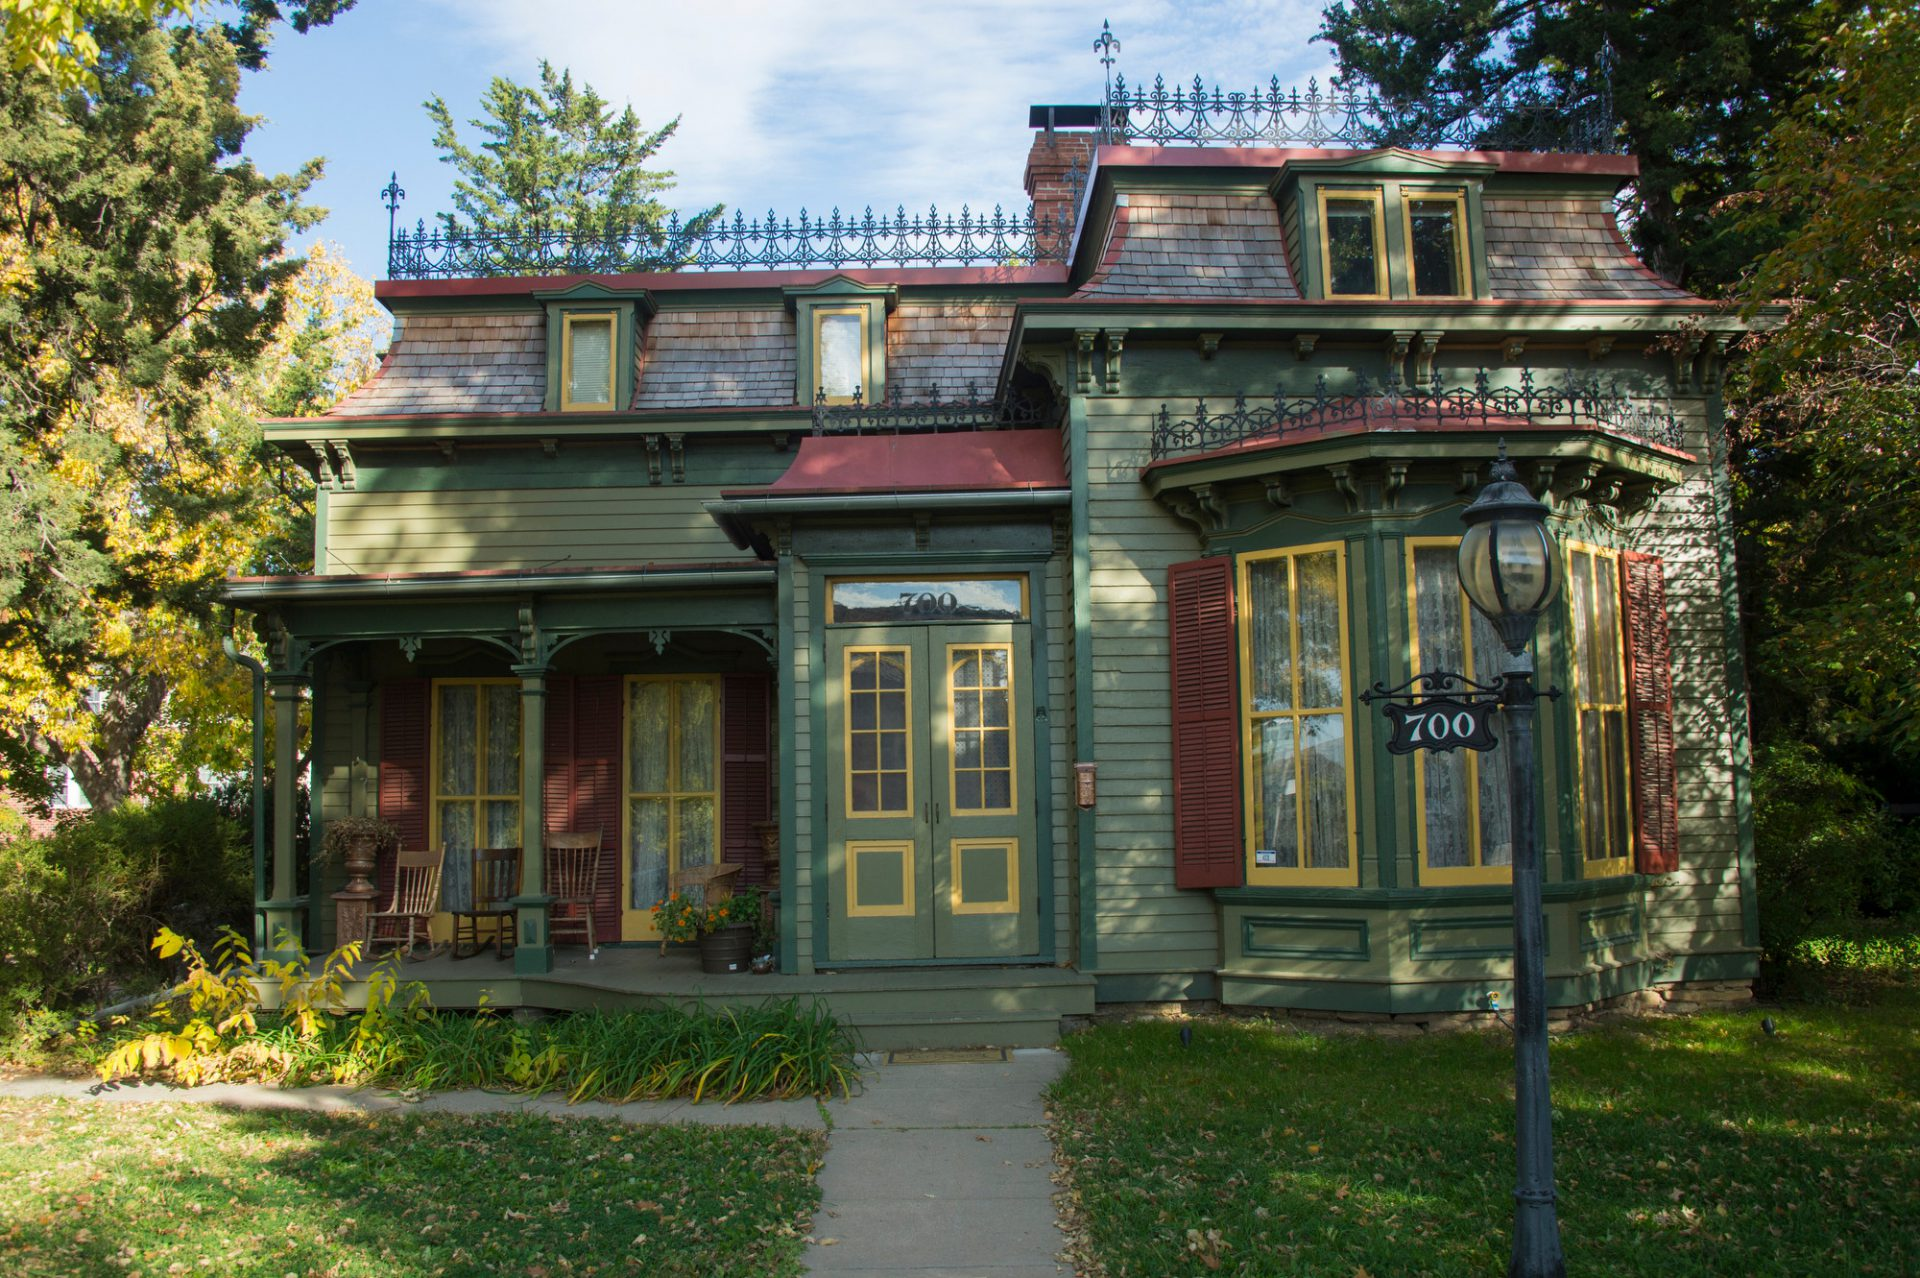 Photo: The historic Lewis-Syford house on the University of Nebraska-Lincoln campus in Lincoln, Nebraska.